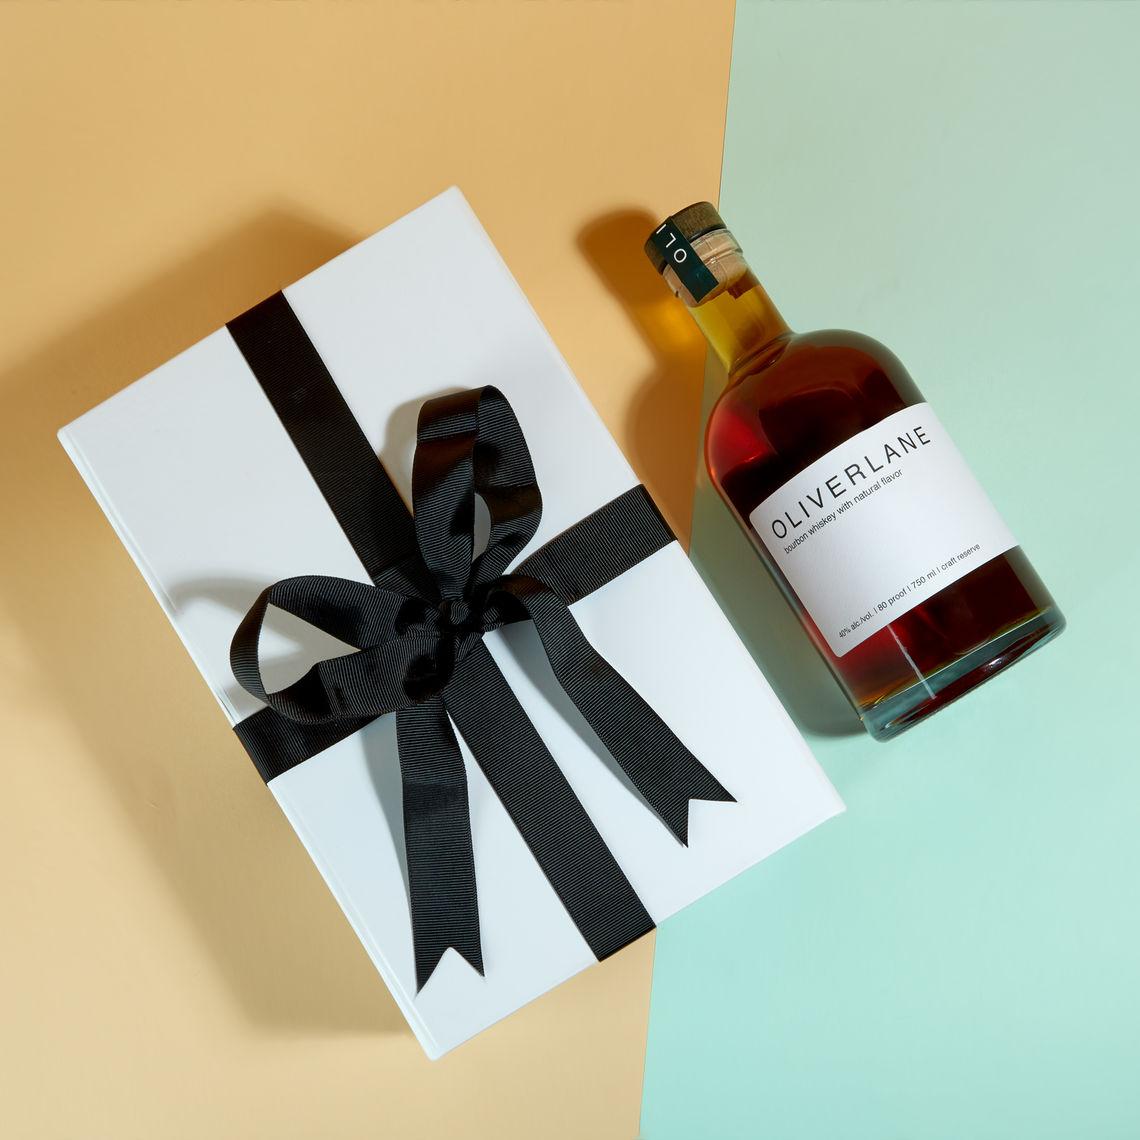 oliverlane whiskey gift